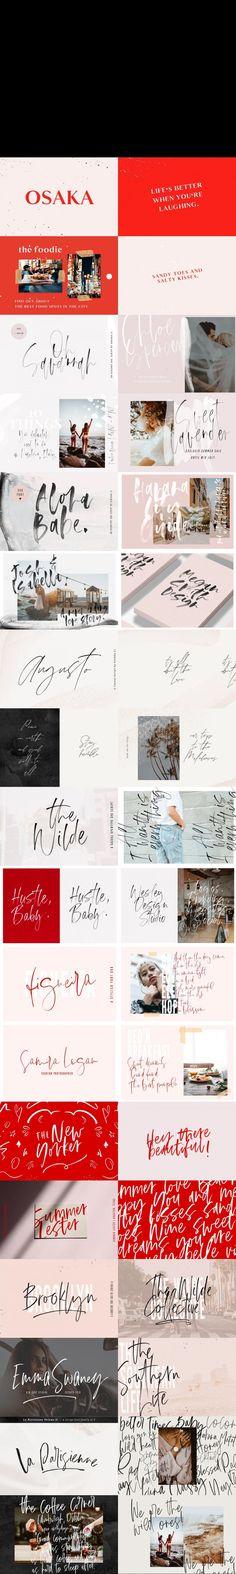 HANDWRITTEN FONT BUNDLE   188 FONTS #fontbundle #signate #calligraphyfonts #texture #creatorkit #hand-letteredfonts #pre-madelogos #otf #creatorkit #watercolourbackground #handwritingfonts #logofonts #pre-madelogos #fonts #opentype #goldswashes #monoscript #fonts #pen Calligraphy Fonts, Typography Fonts, Typography Design, Lettering, Best Script Fonts, Cool Fonts, Feminine Fonts, Font Design, Font Alphabet